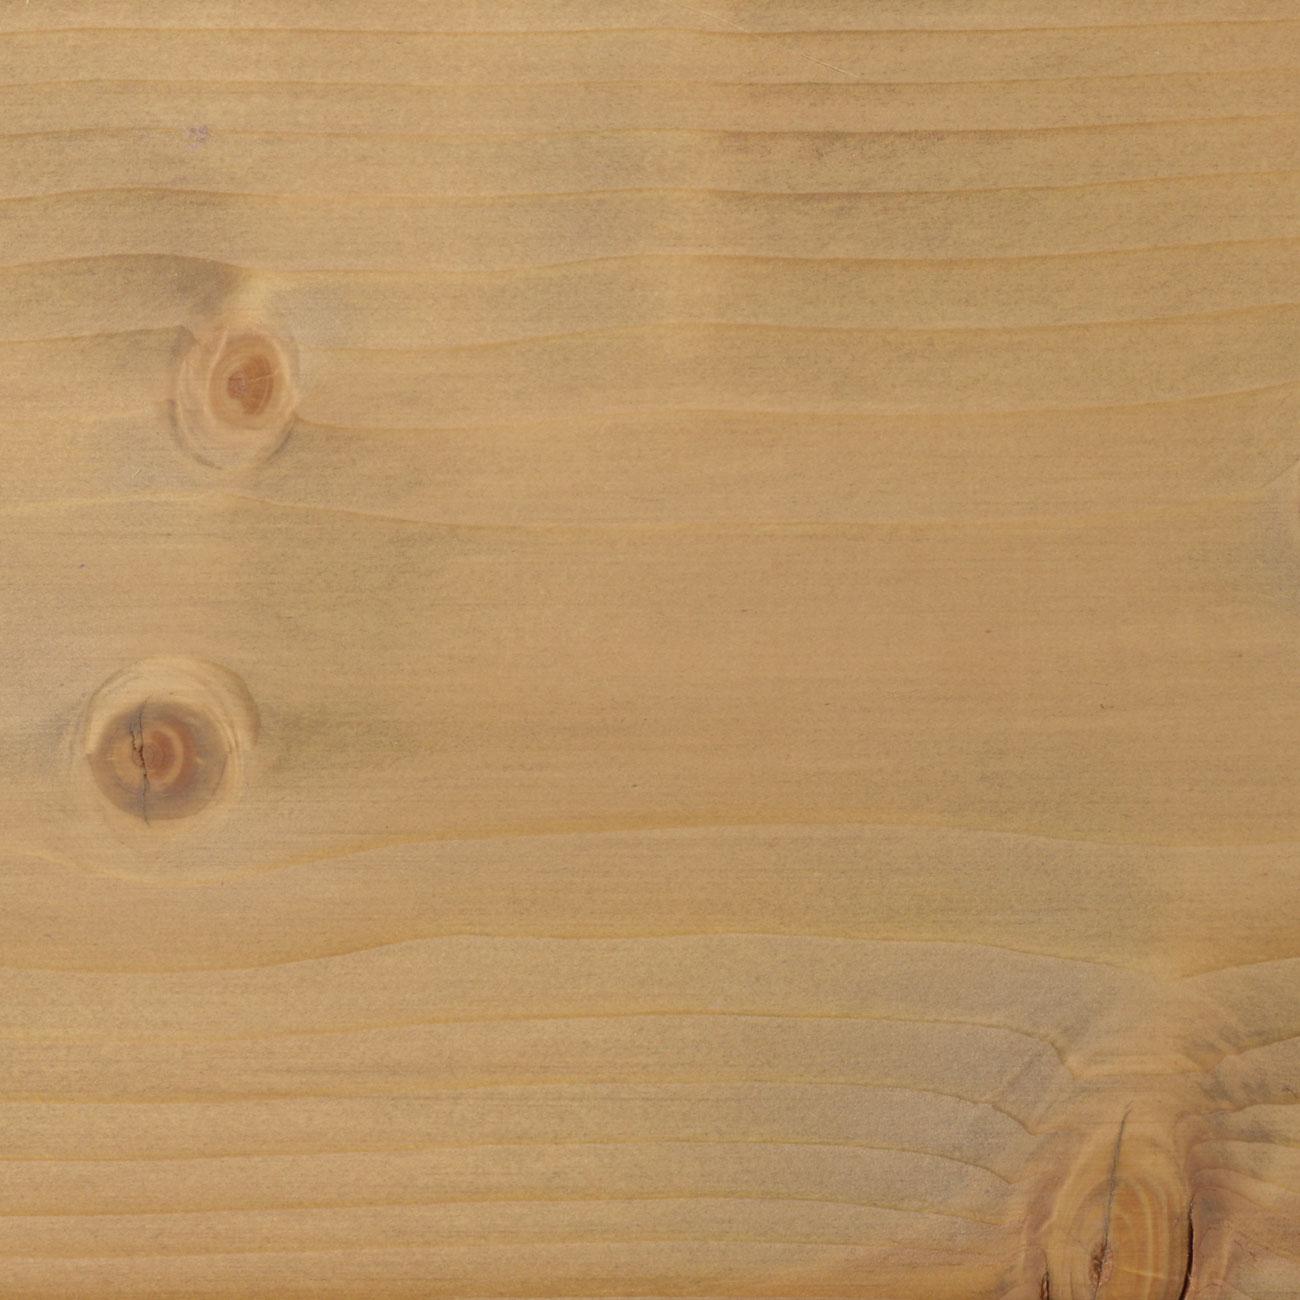 115. Fichte geschliffen mit Faxe Speziallauge zzgl. 5% Faxe Combicolor grau gelaugt und mit Faxe Holzbodenöl natur geölt